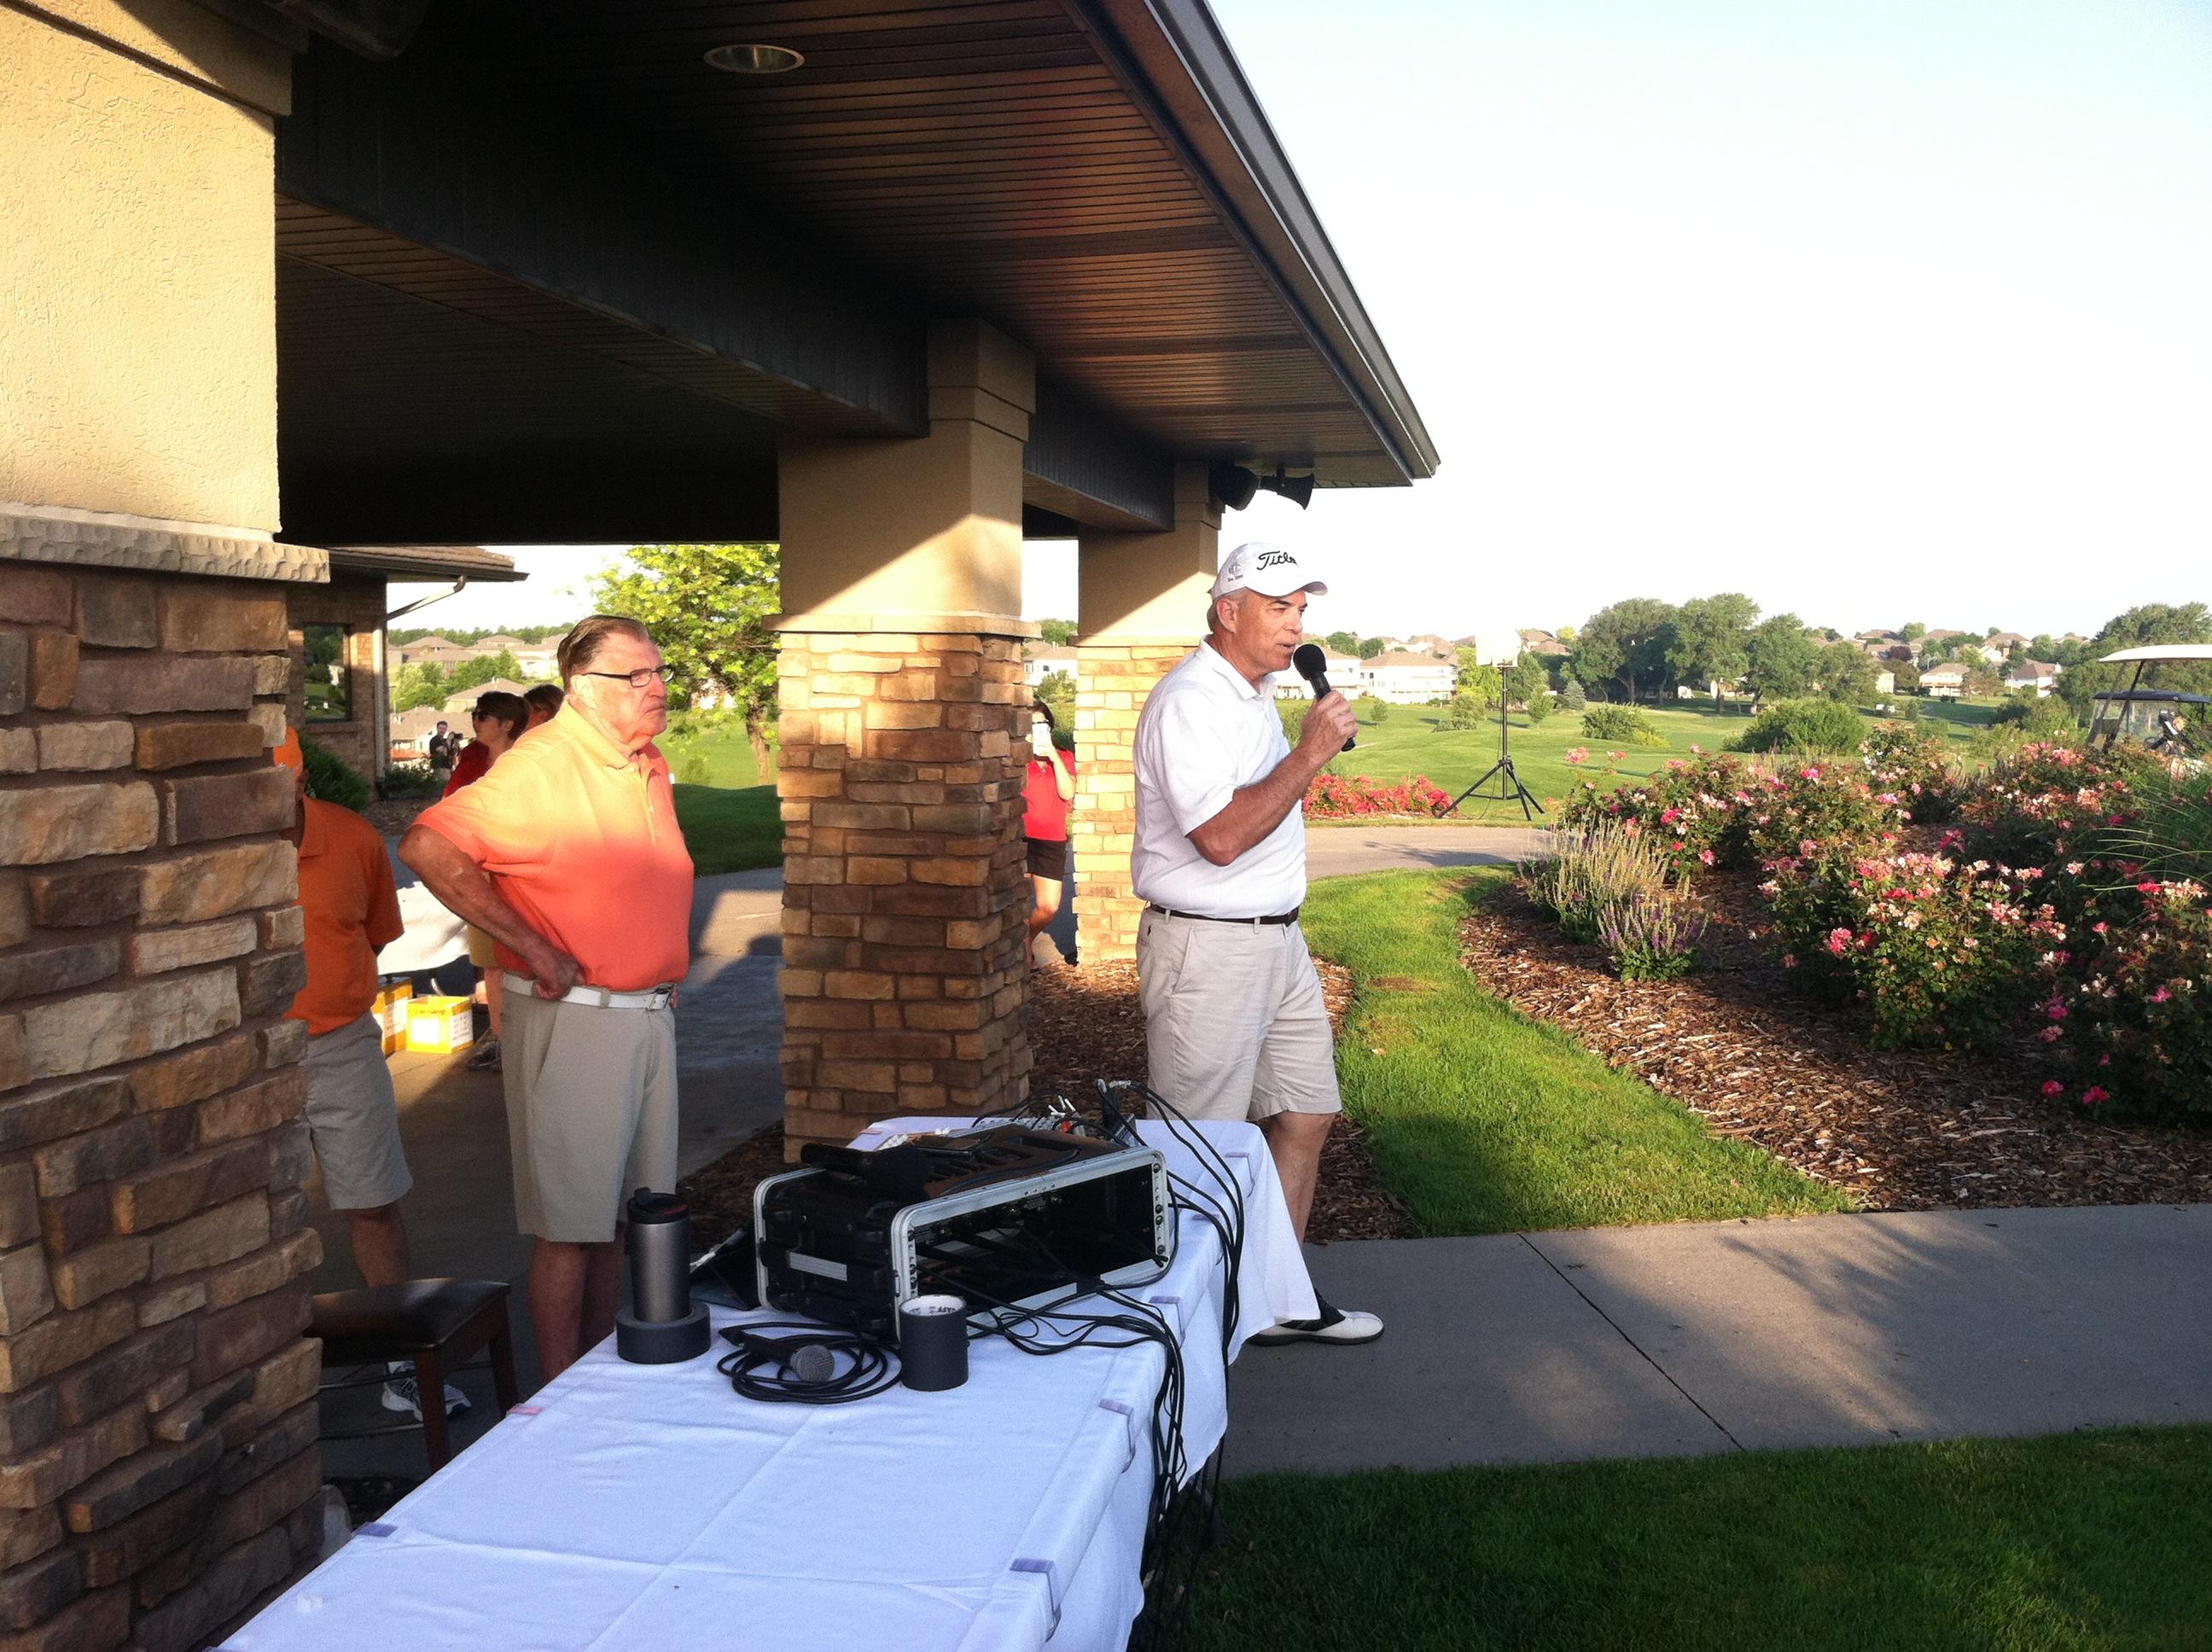 Chamber President & CEO David G. Brown welcomes BOTG golfers to Tiburon.